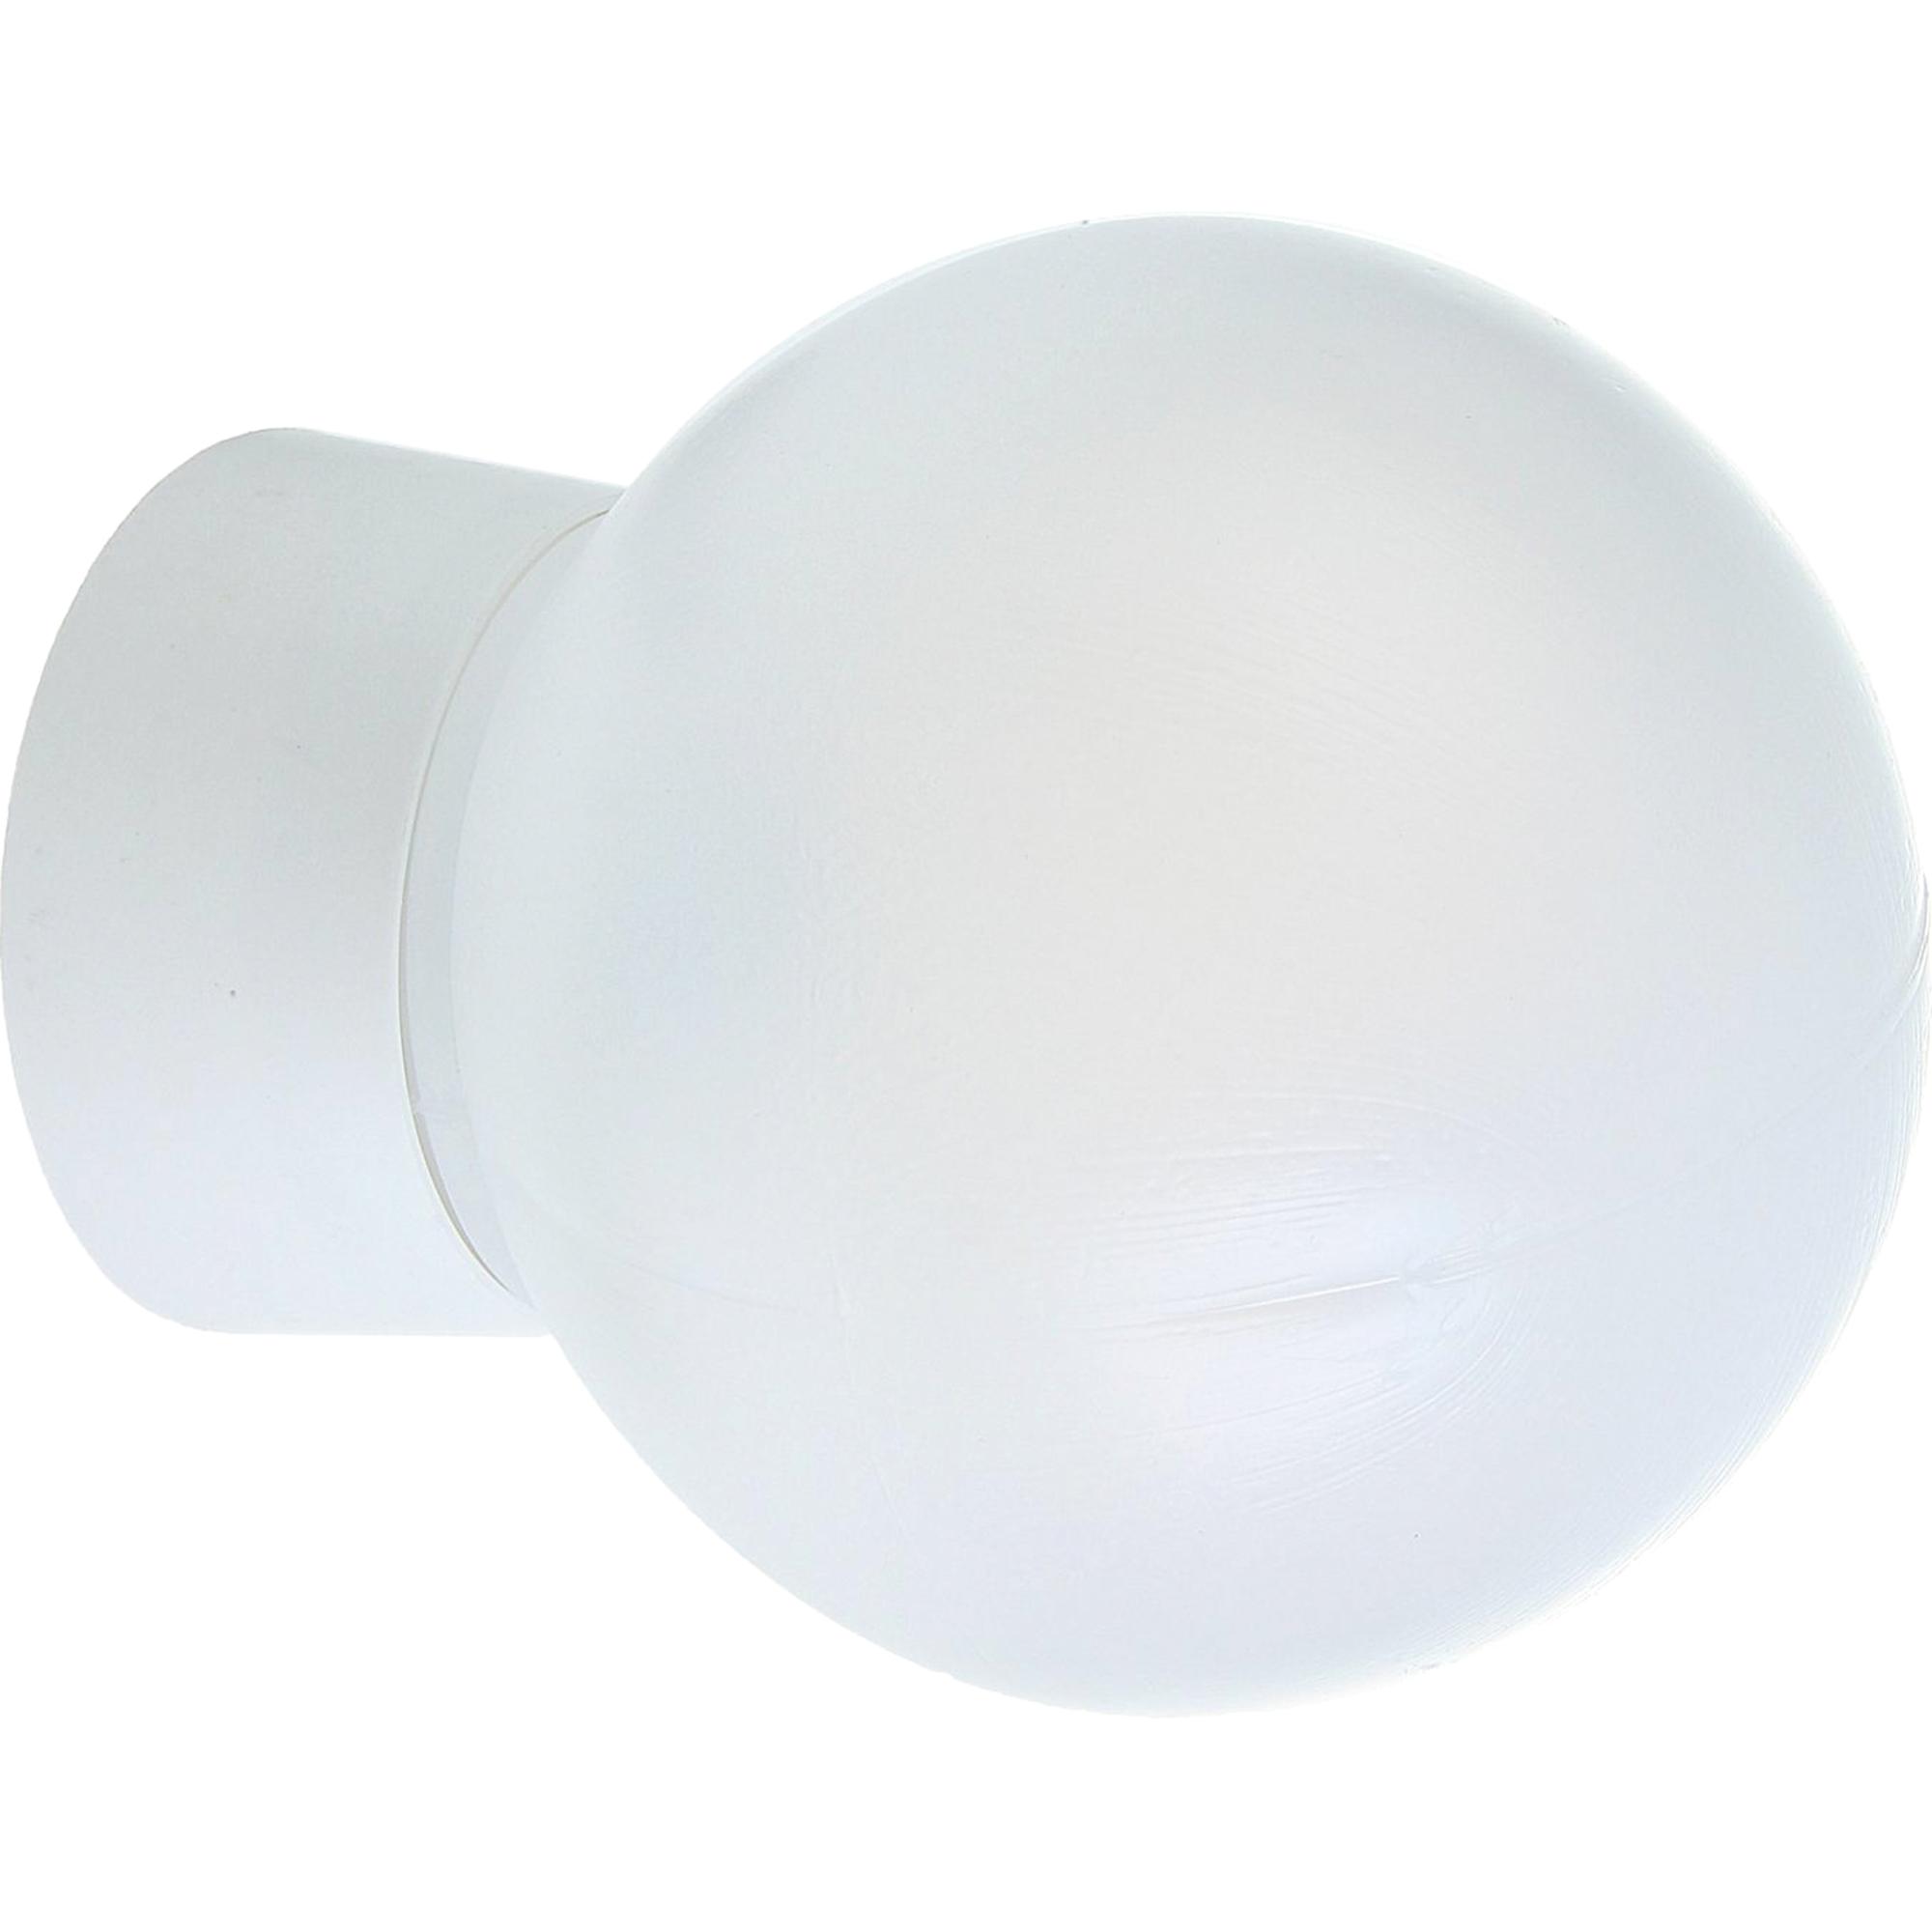 Светильник шар НББ 1хЕ27х60 Вт пластик, цвет белый